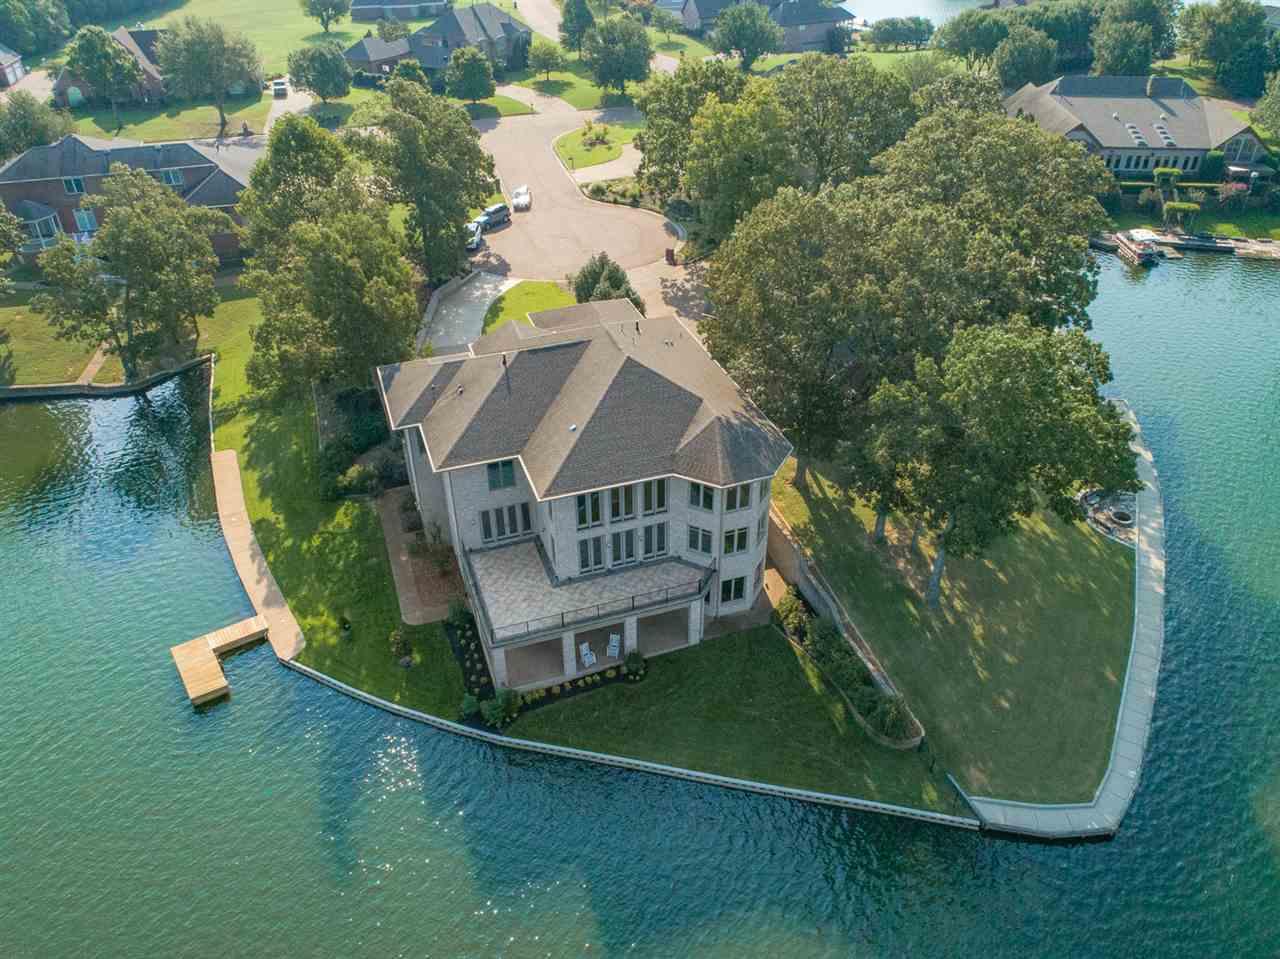 Lakeland Tn Real Estate Listing Report Steve Boysen Real Estate